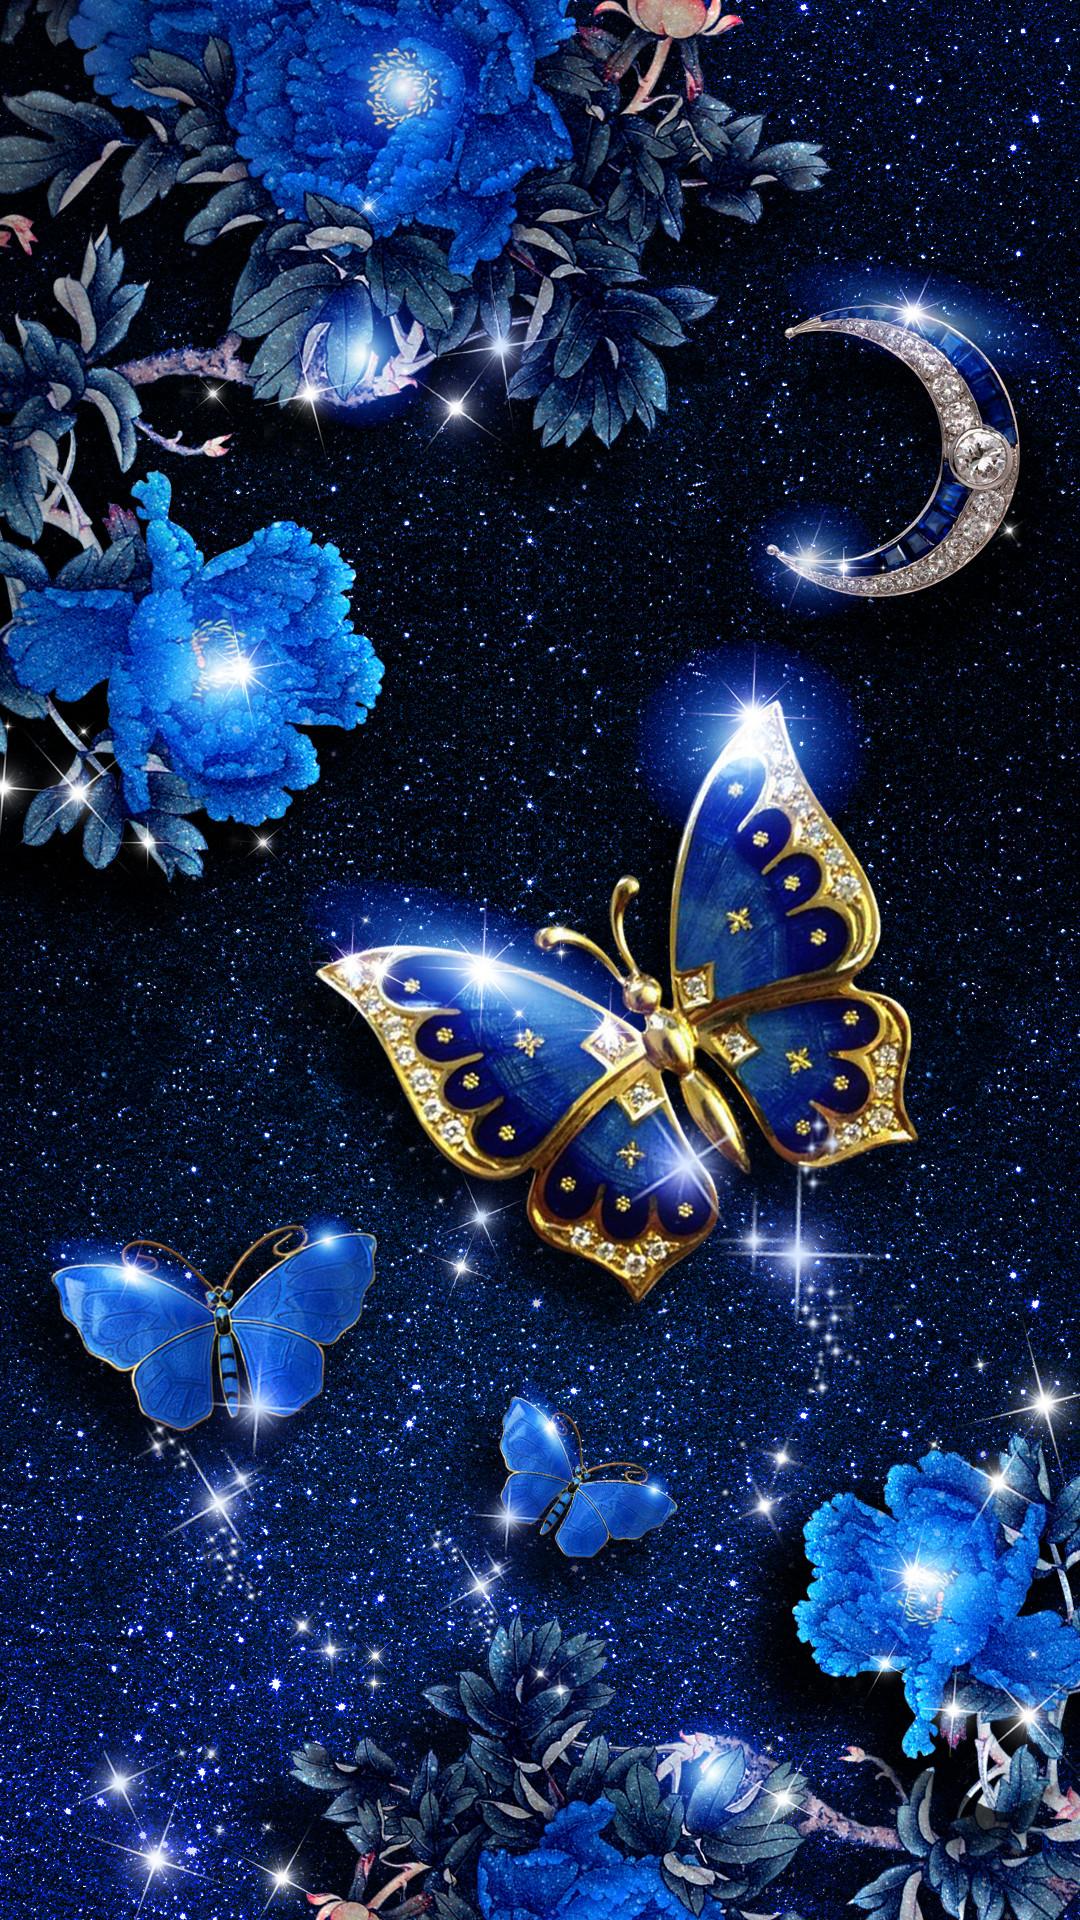 live wallpaper android apk ronaldo messi wallpaper blue butterfly wallpaper